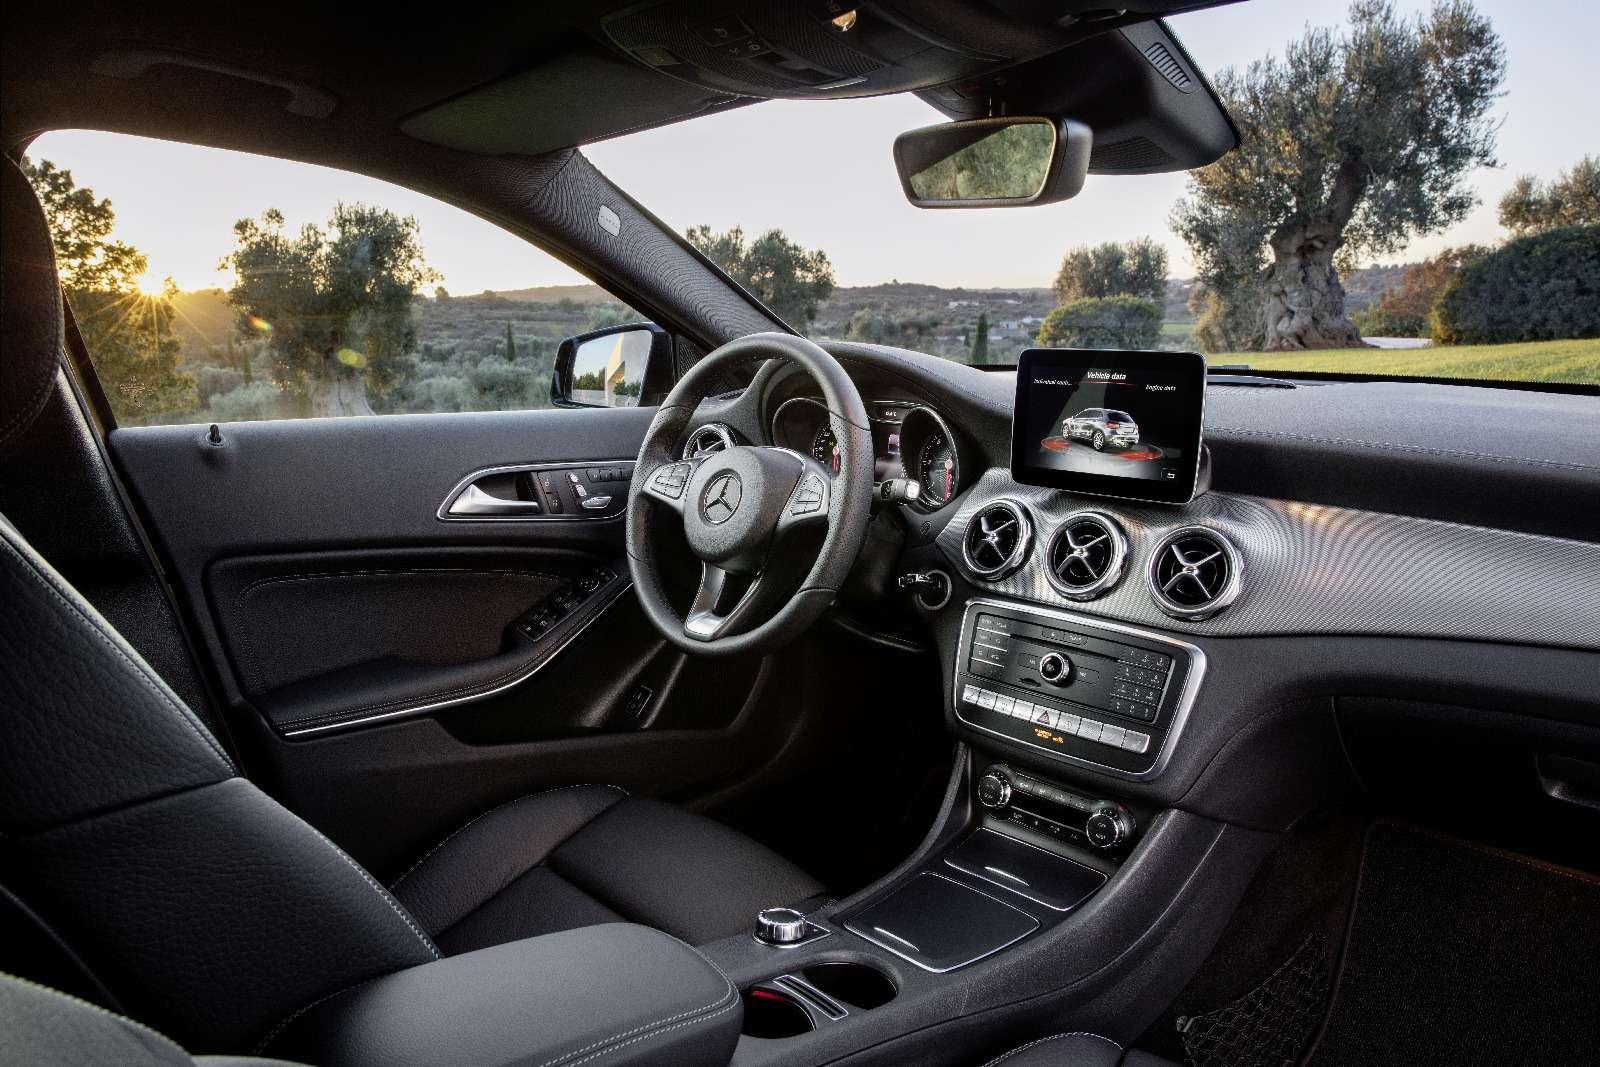 Mercedes-Benz GLA стал краше, нонепросторнее— фото 690064